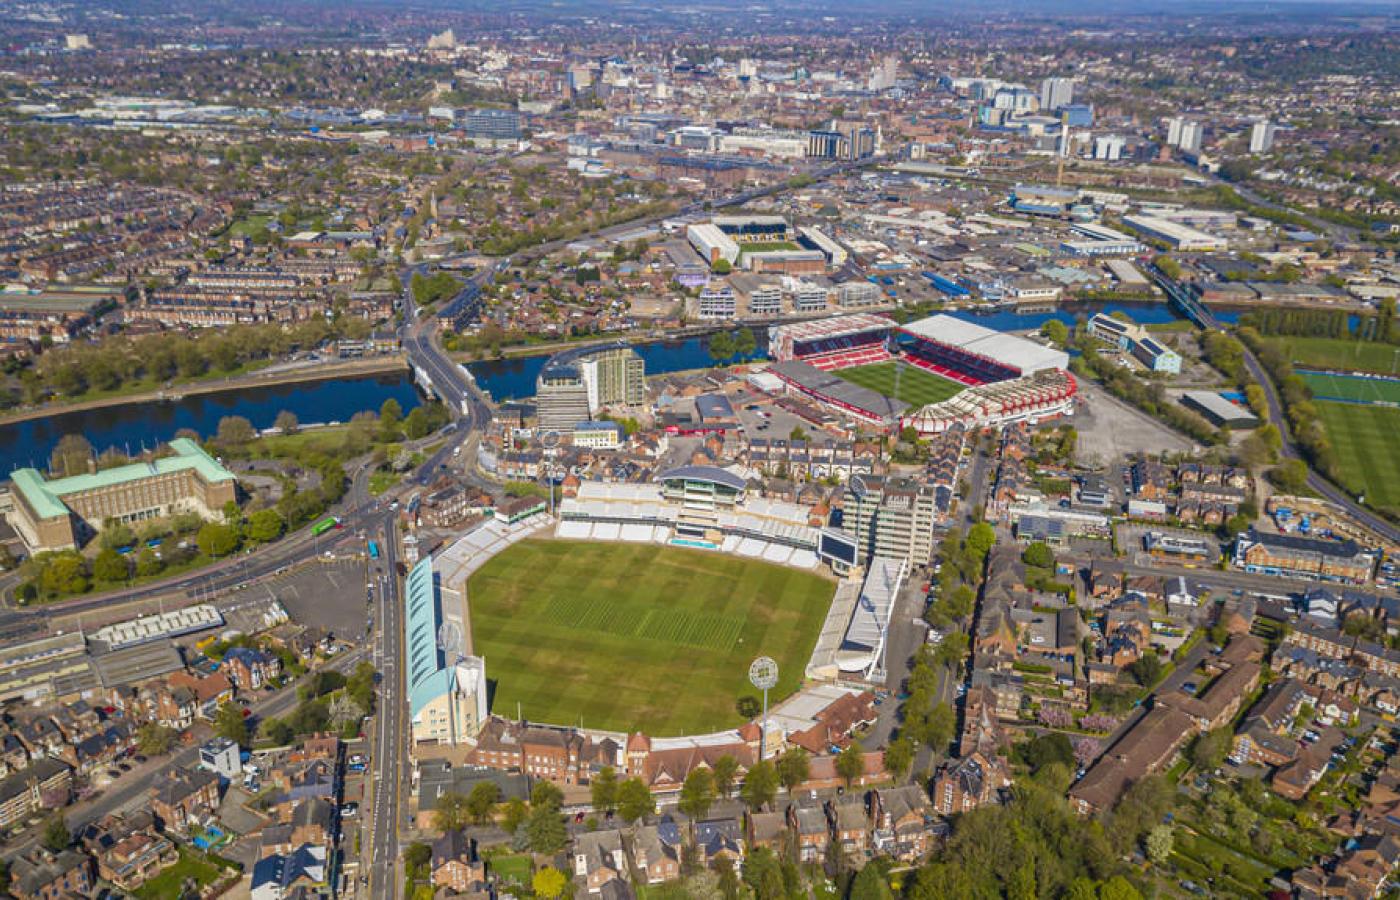 Trent Bridge cricket ground, Nottingham Forest and Notts County